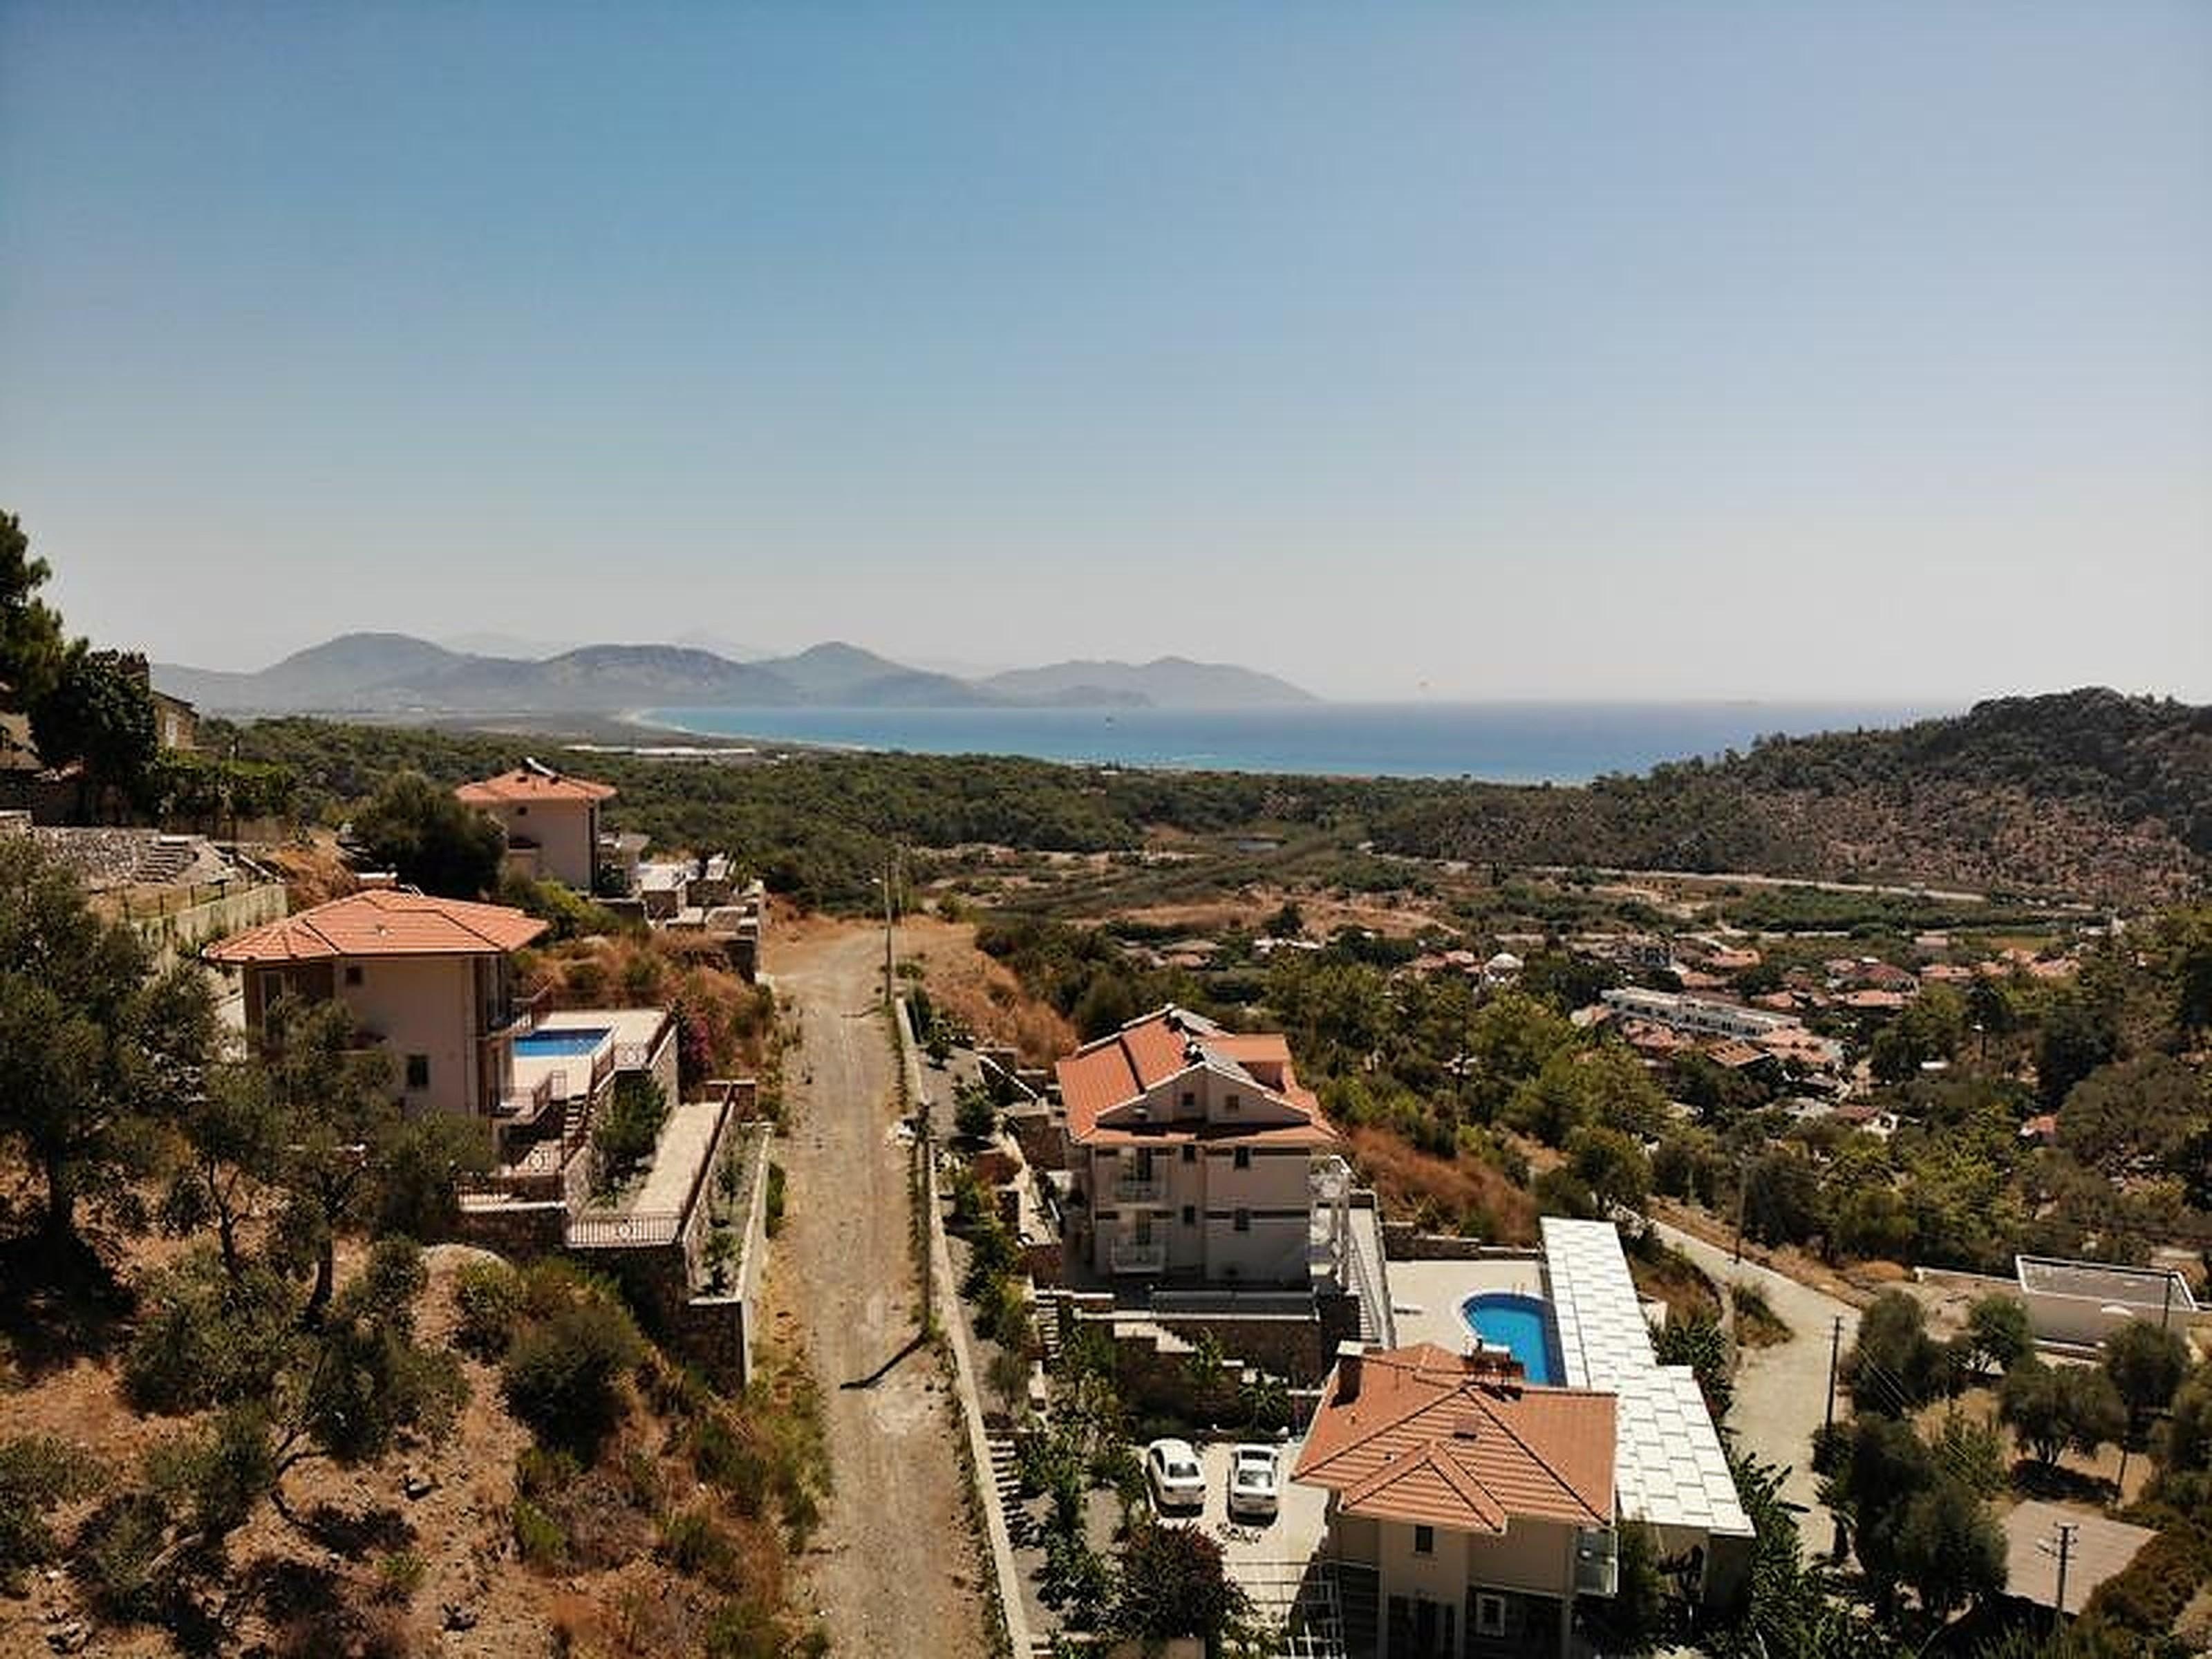 Ferienwohnung Begonville Apartment Klein (2654617), Sarıgerme, , Ägäisregion, Türkei, Bild 7